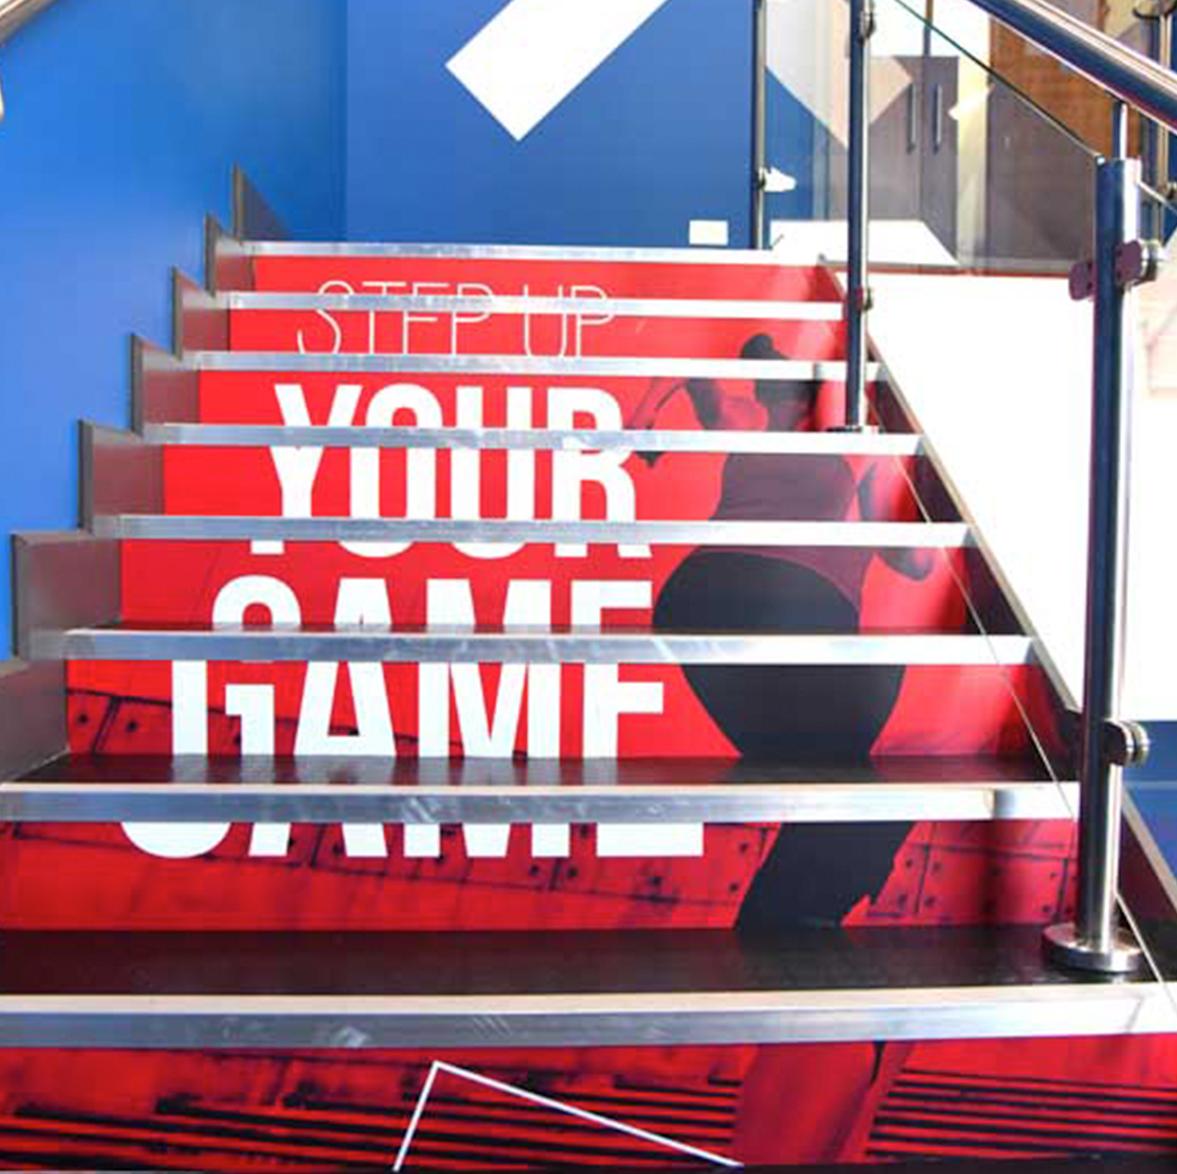 Glogym stairs graphics